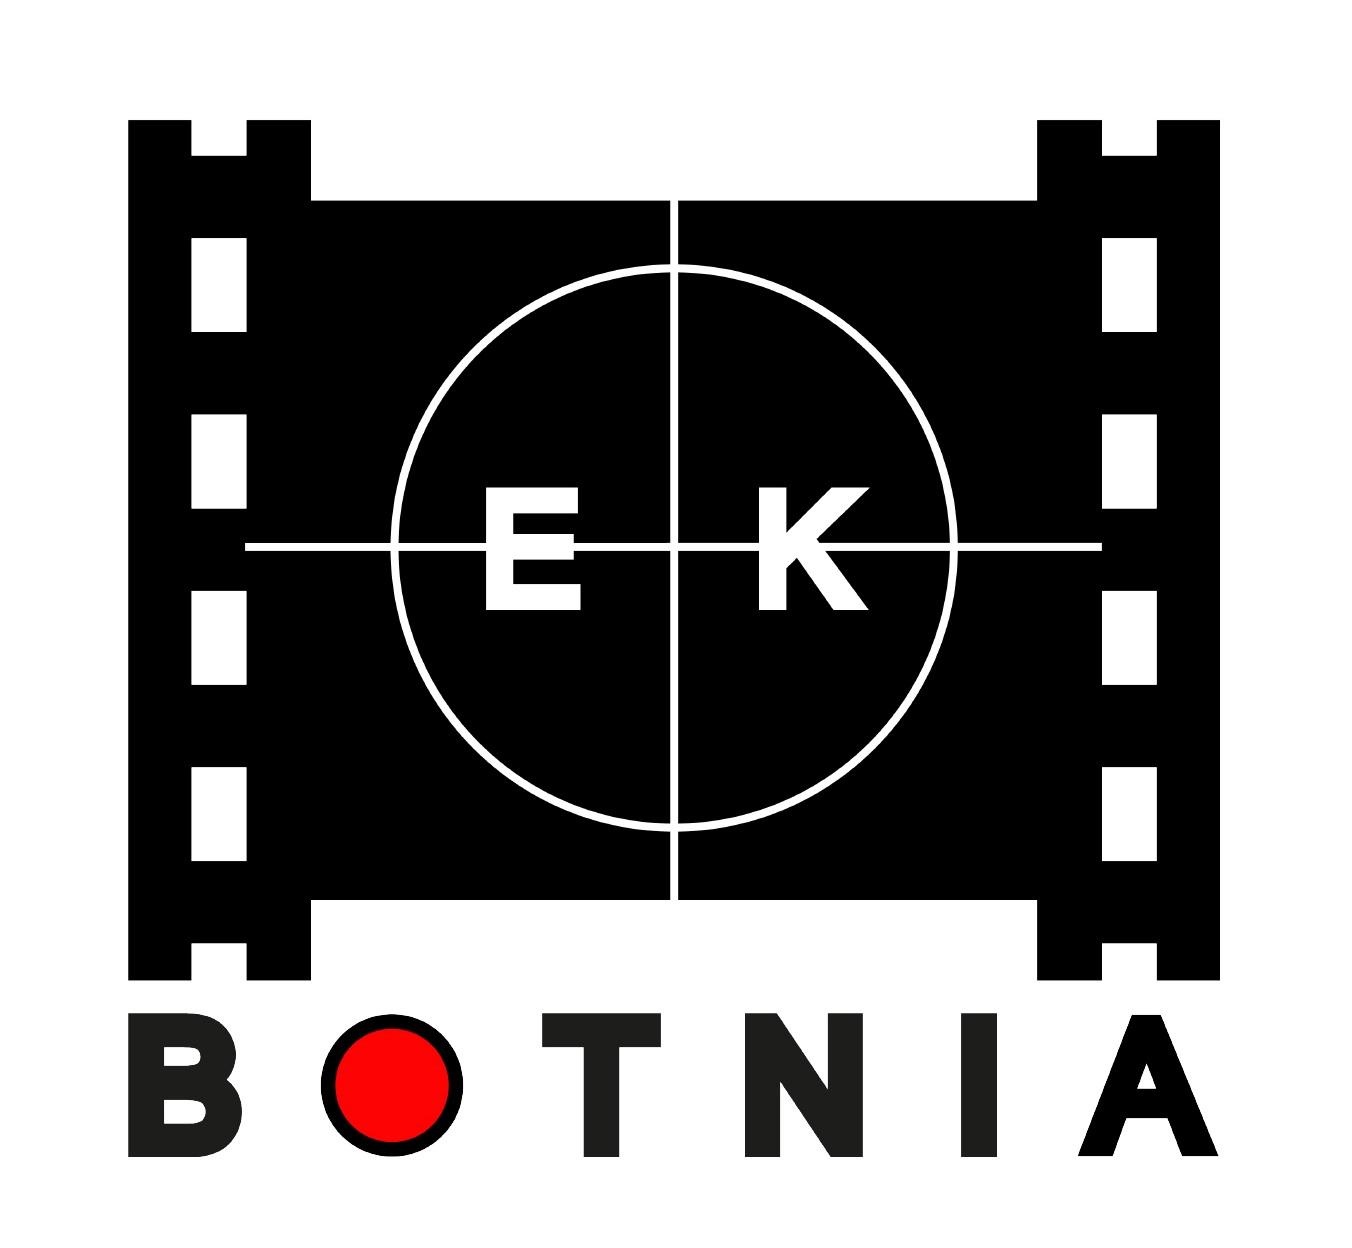 Elokuvakeskus Botnia